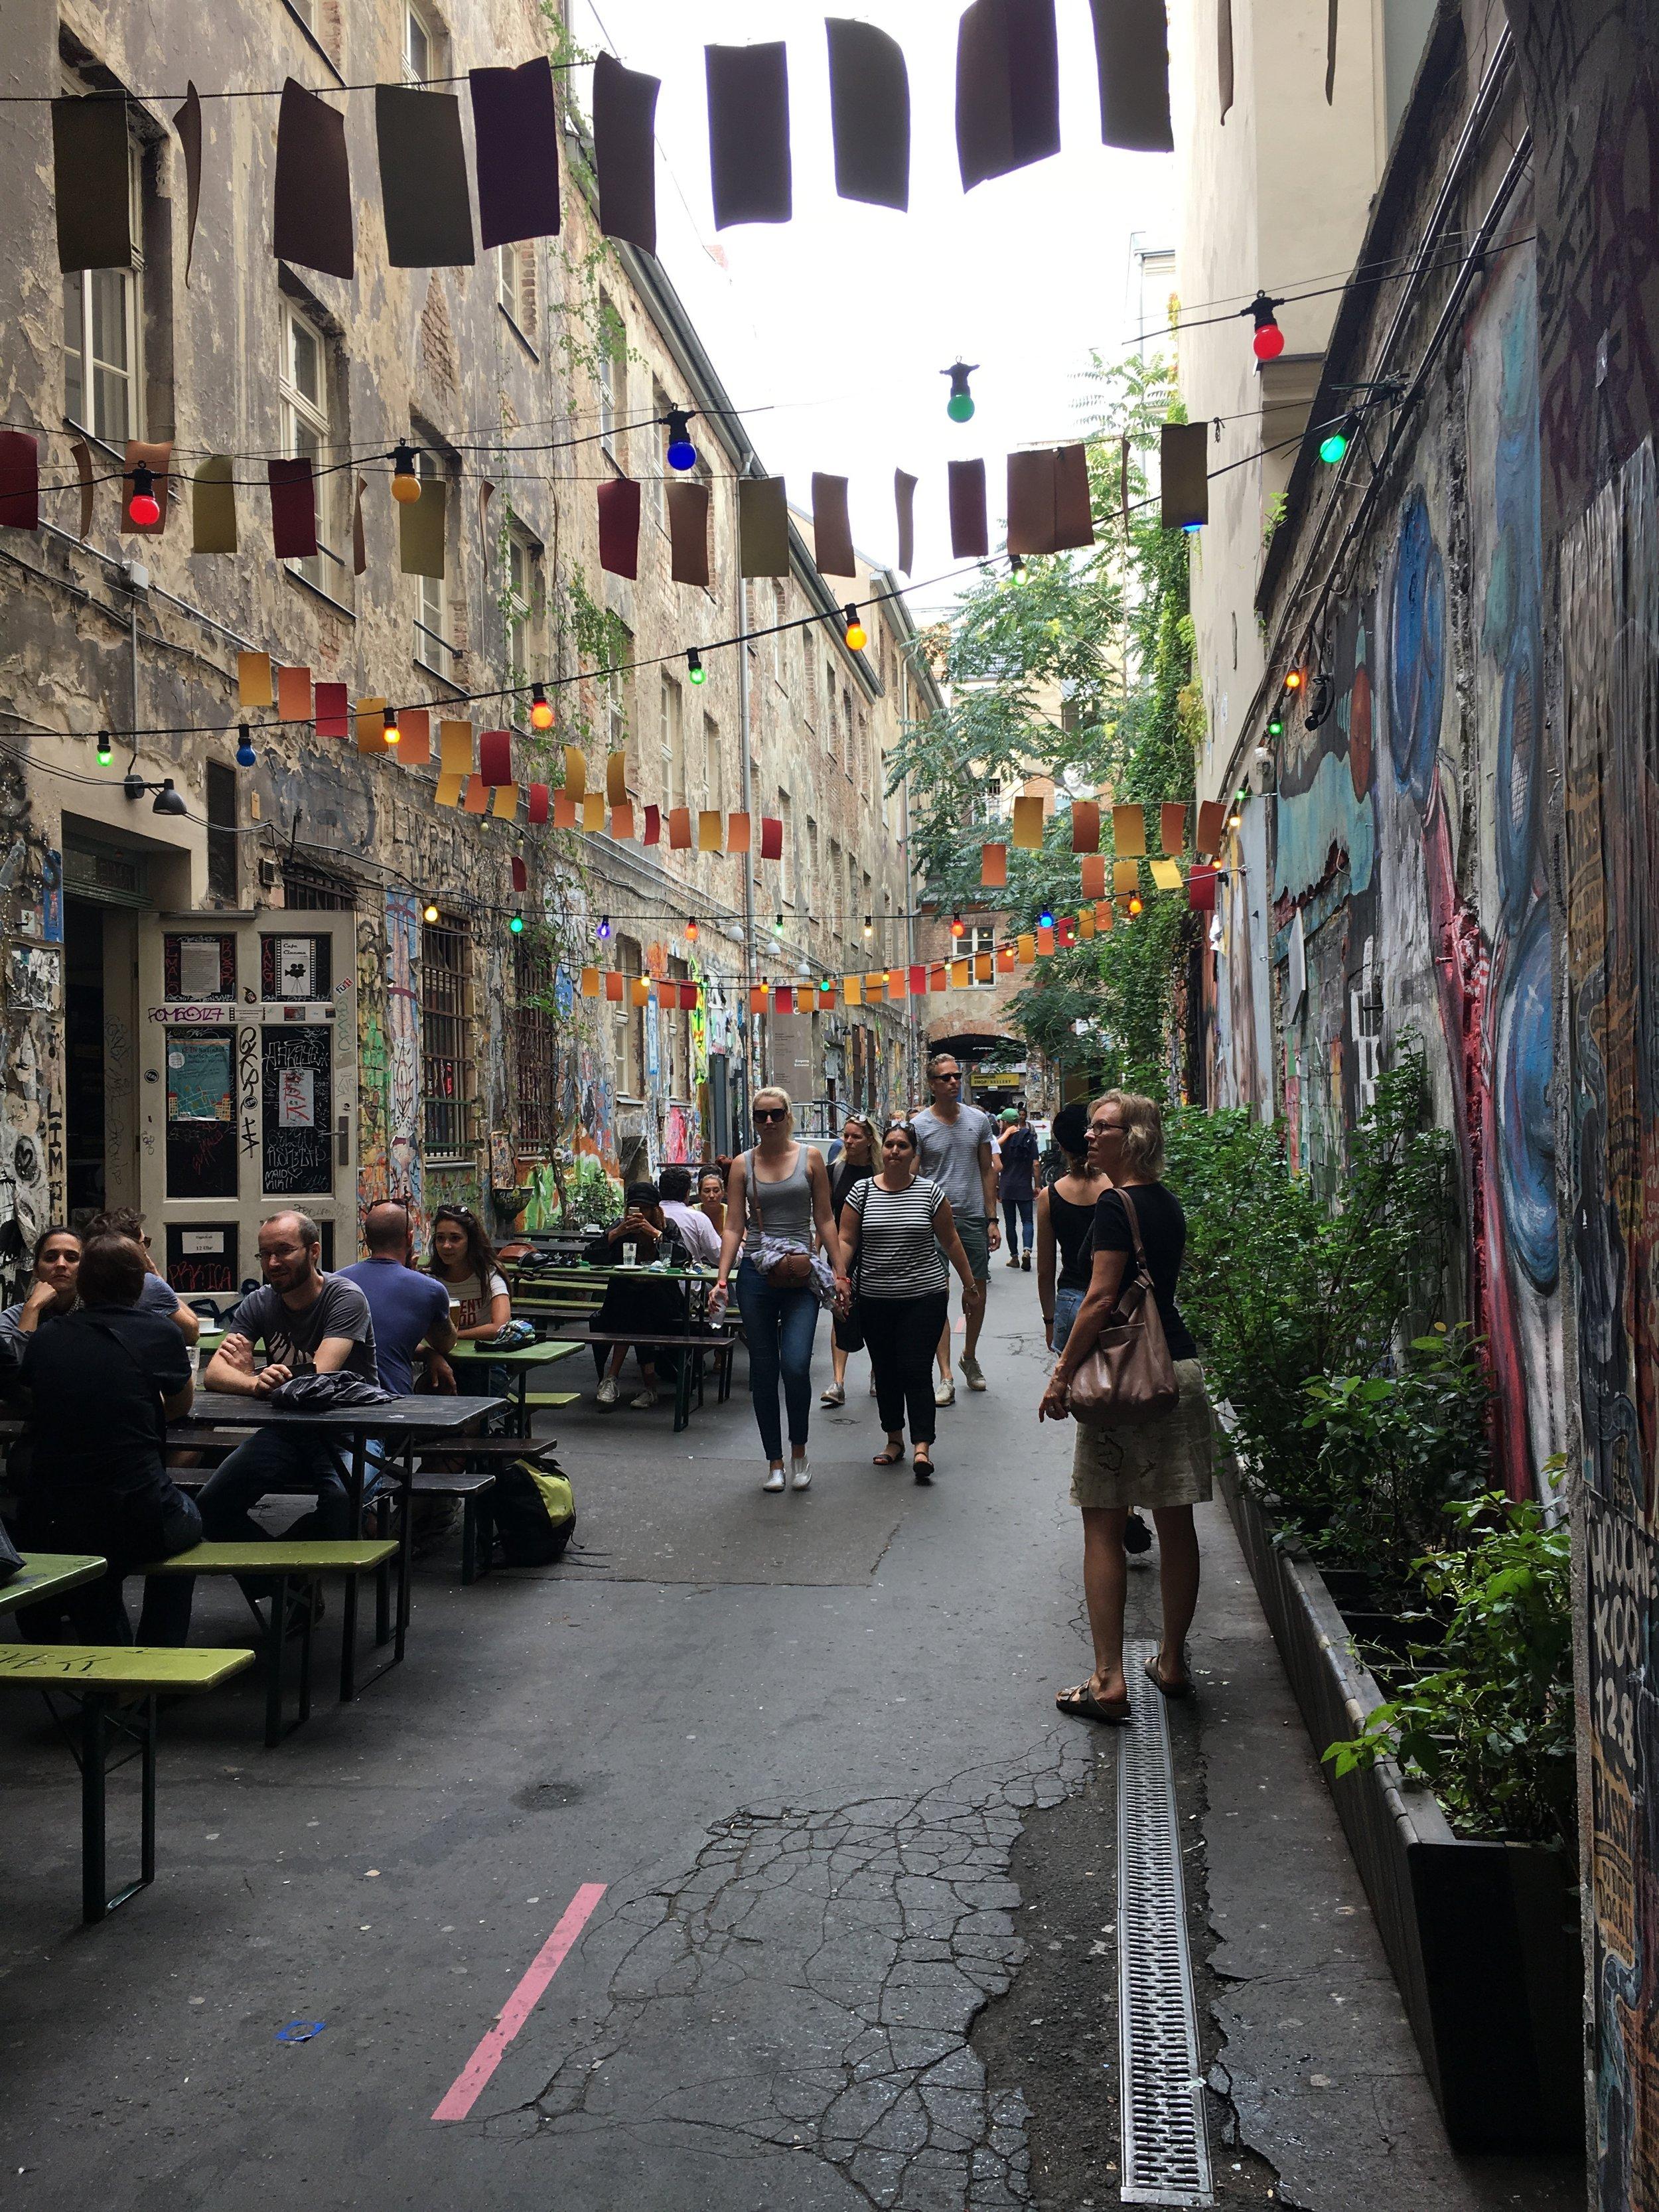 Hackesche-Hoefe-Street-Art-Alley-Berlin